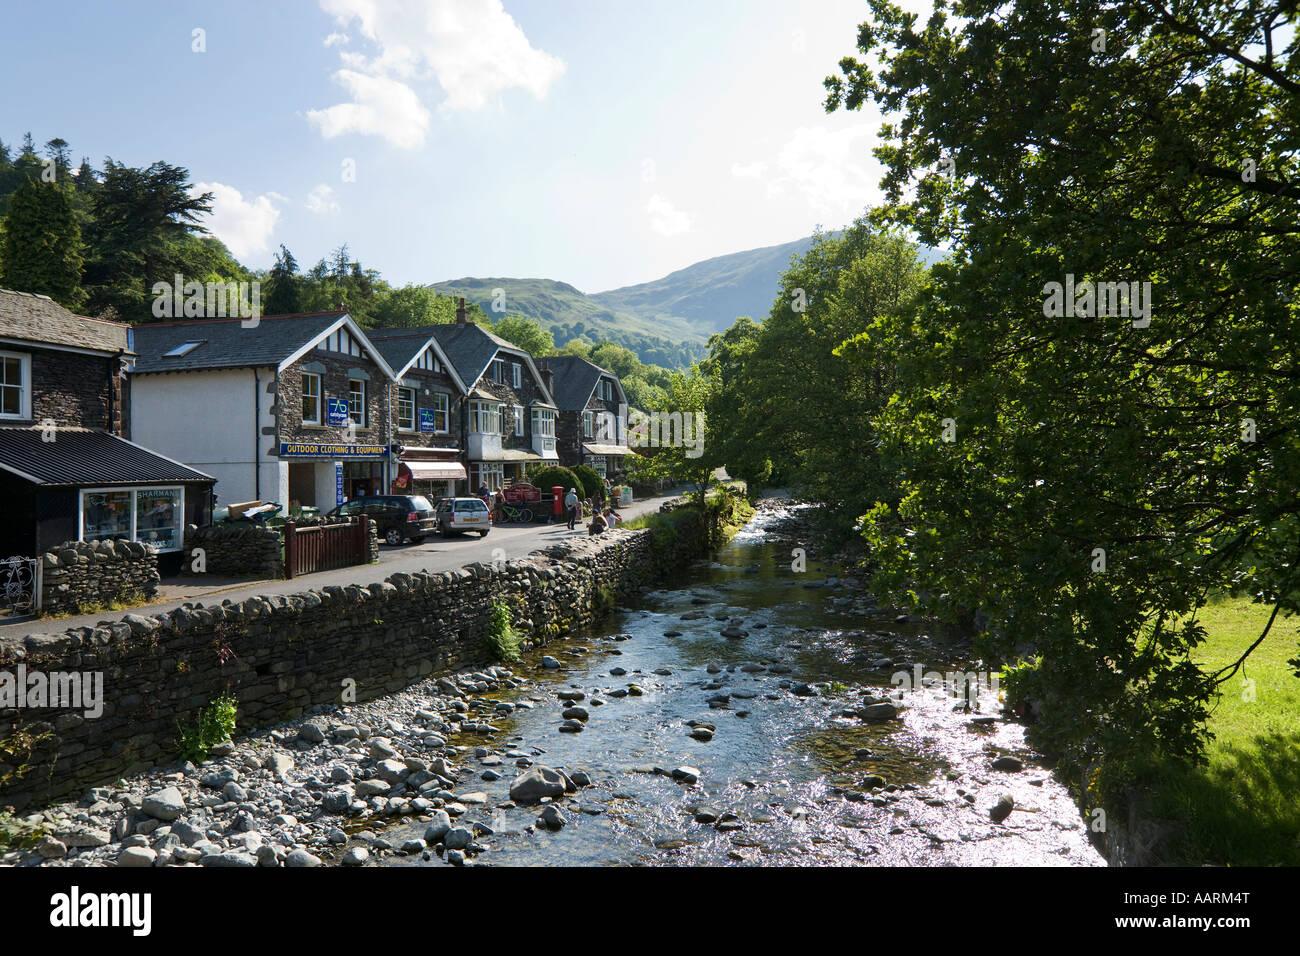 Stream in Village Centre, Glenridding, Ullswater, Lake District National Park, Cumbria, England, UK Stock Photo